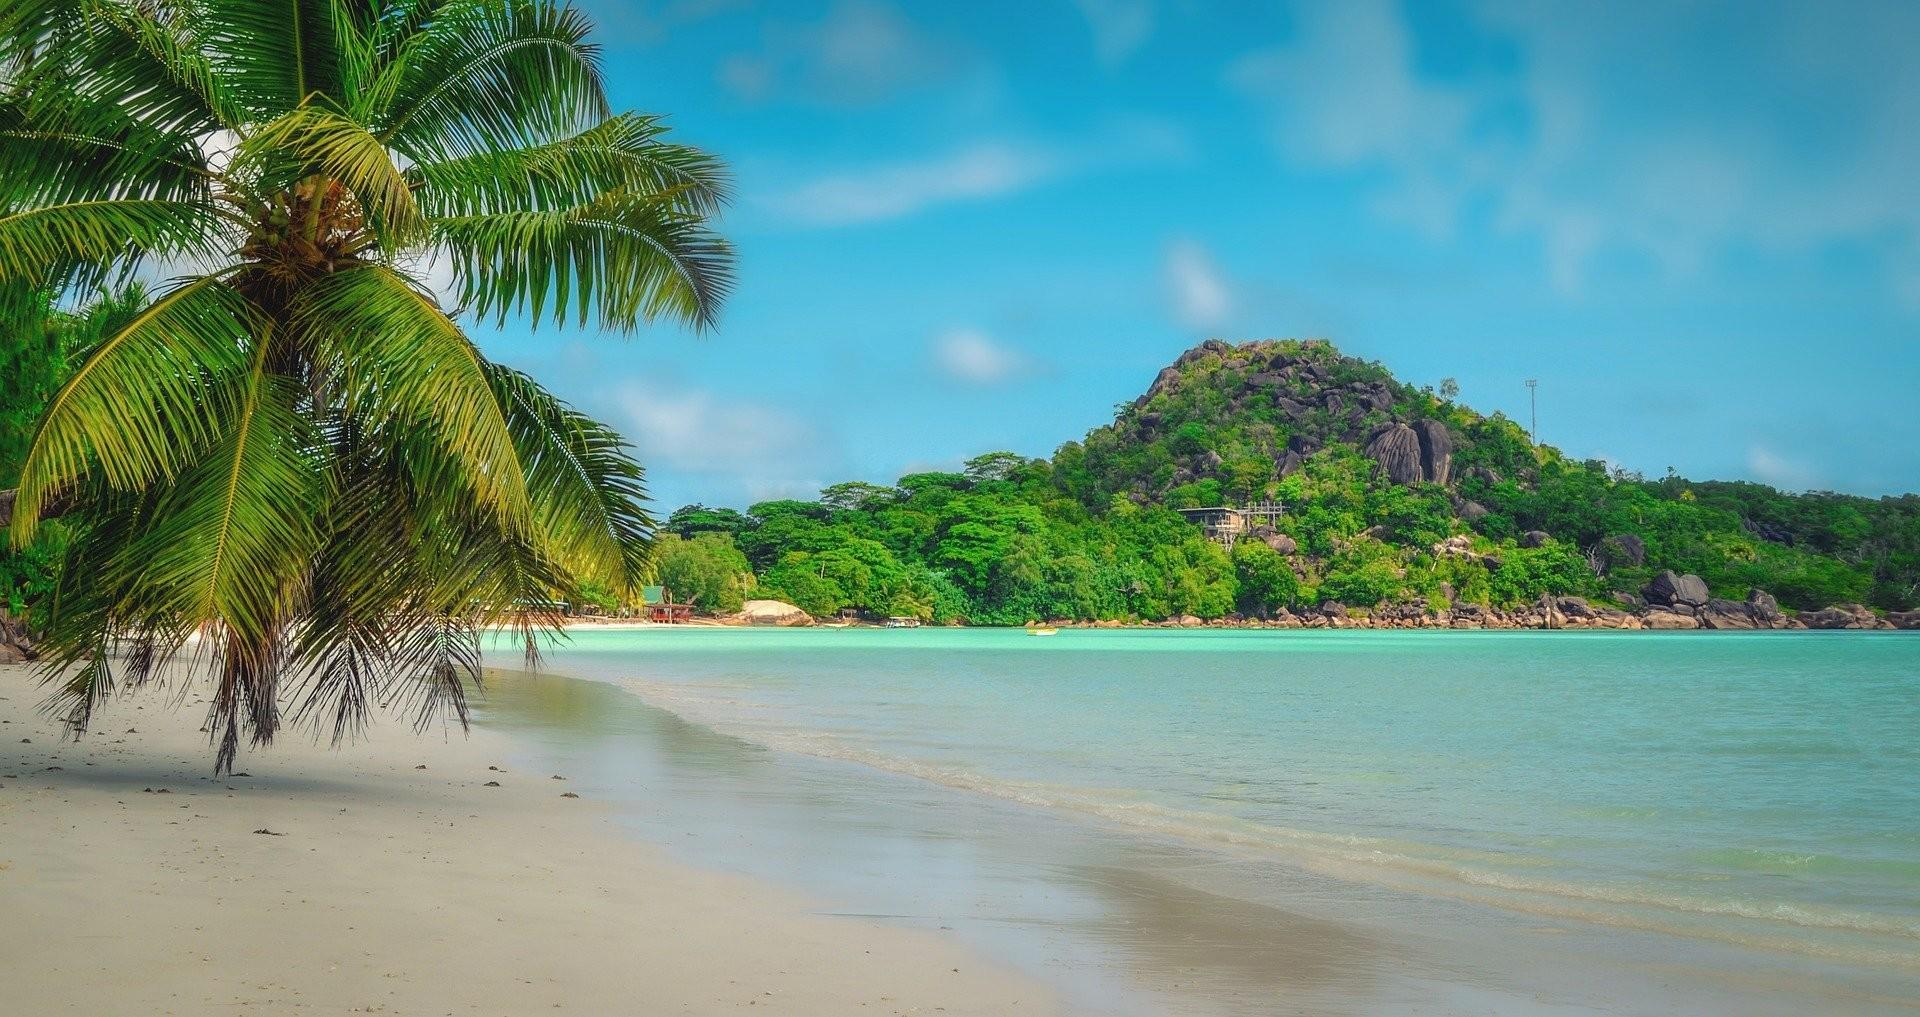 news-main-les-seychelles-etendent-leur-zone-de-protection-marine.1585744752.jpg